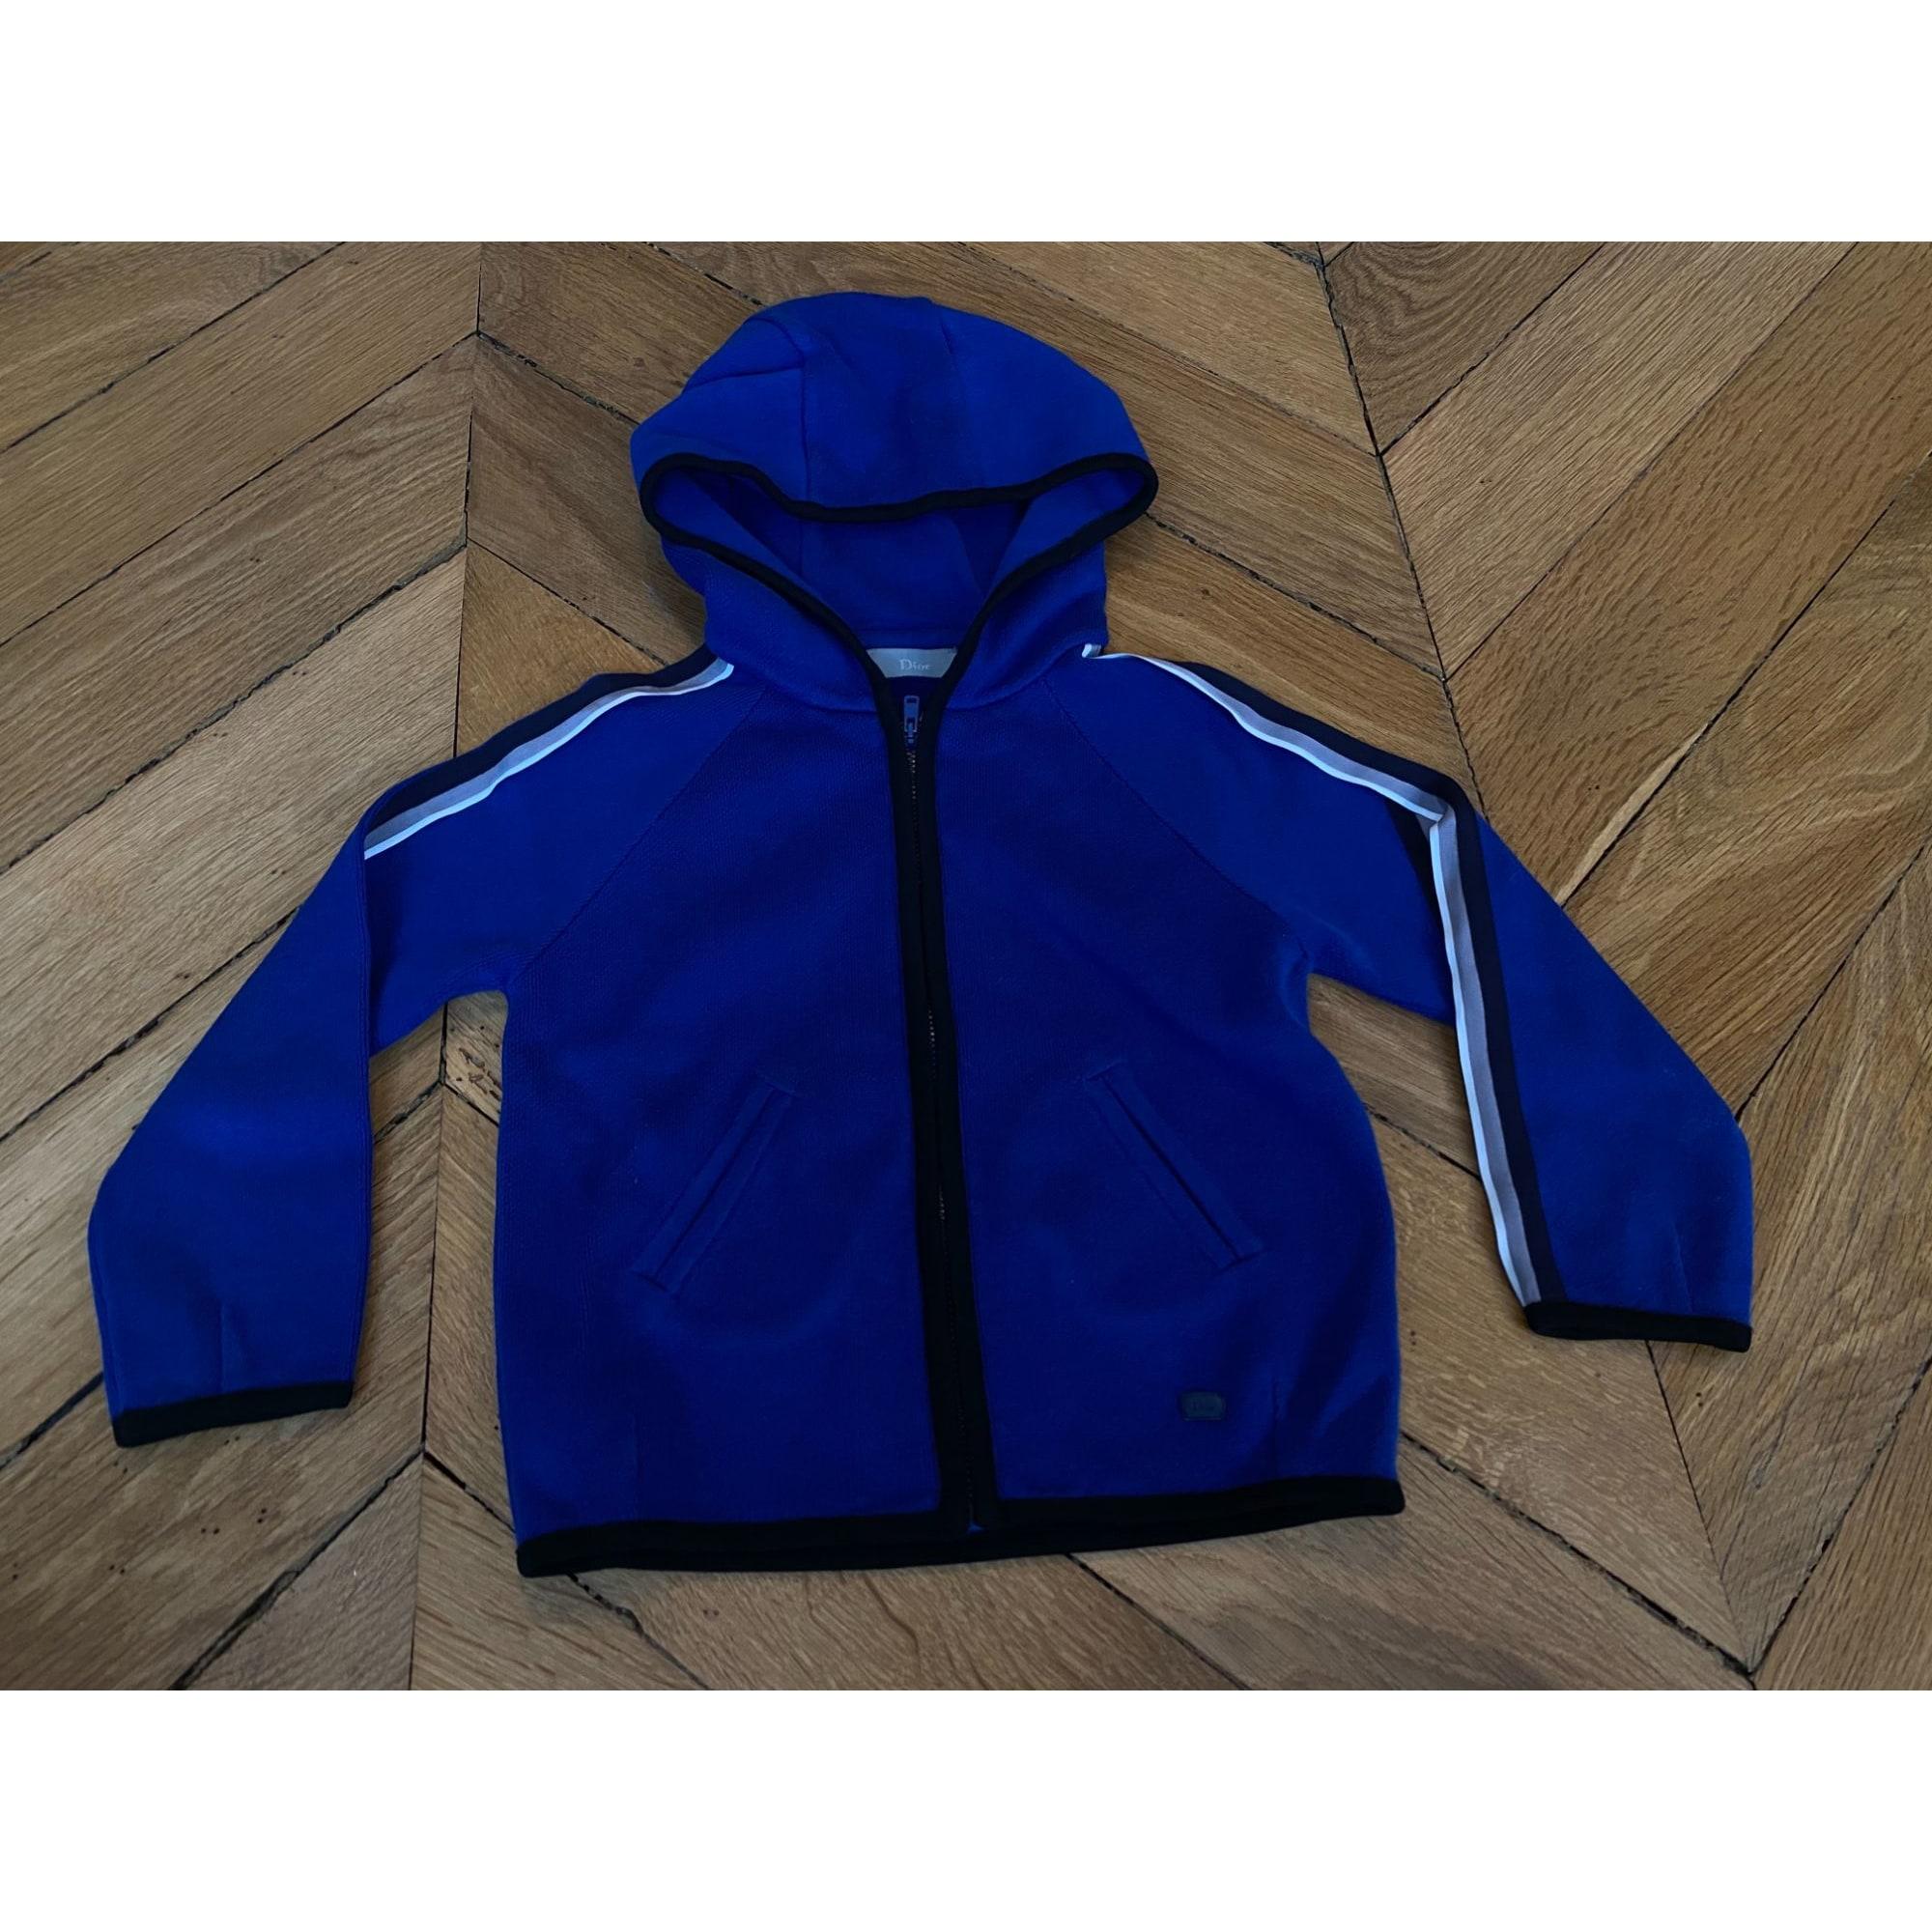 Sweatshirt BABY DIOR Blue, navy, turquoise